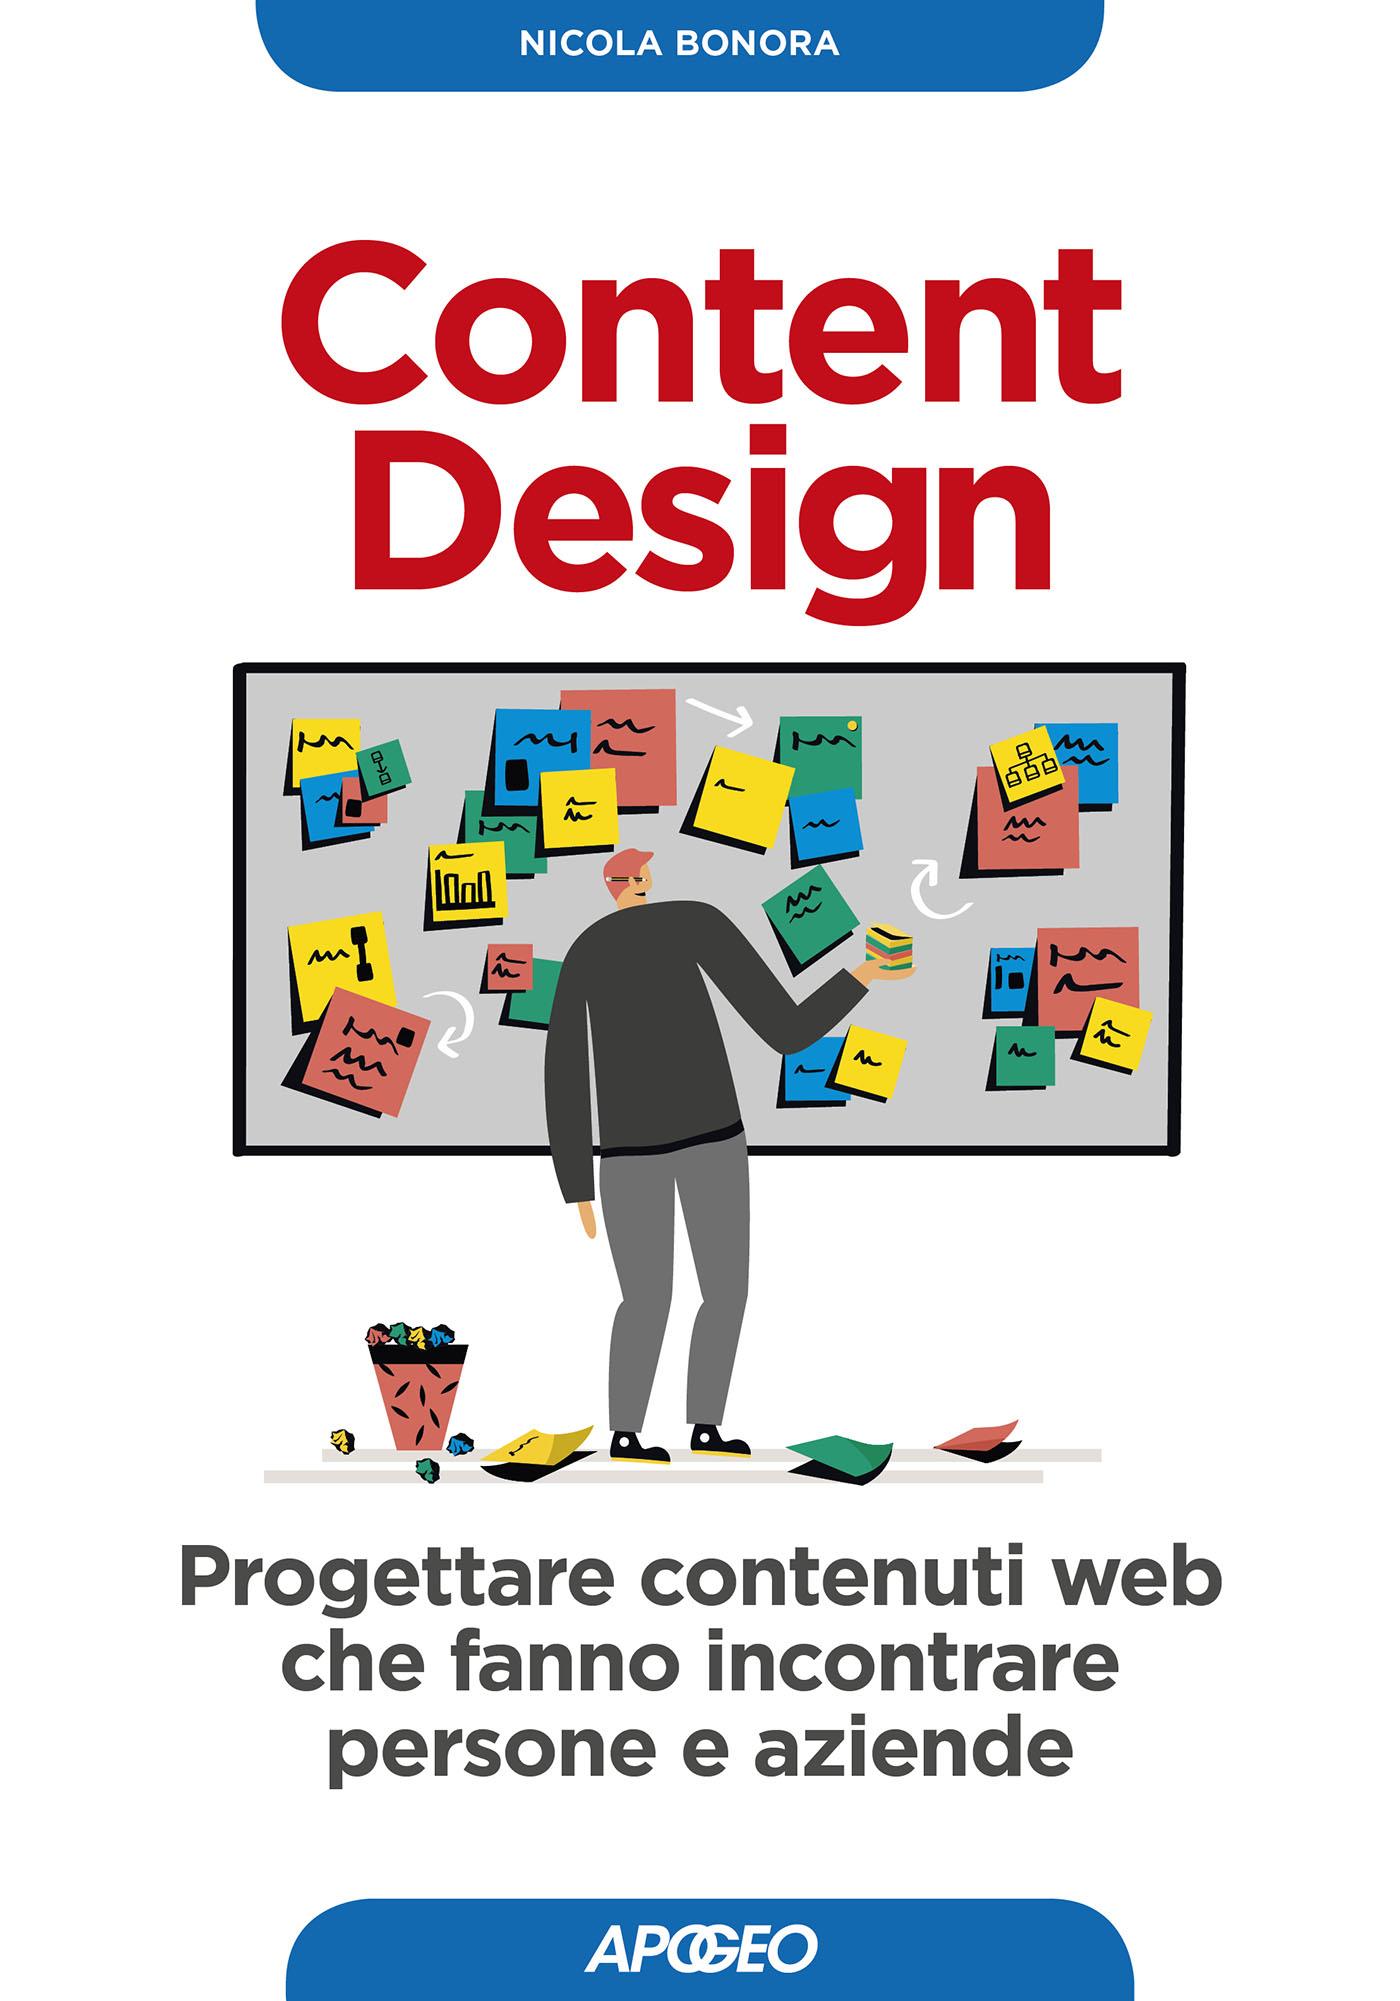 Content Design, di Nicola Bonora